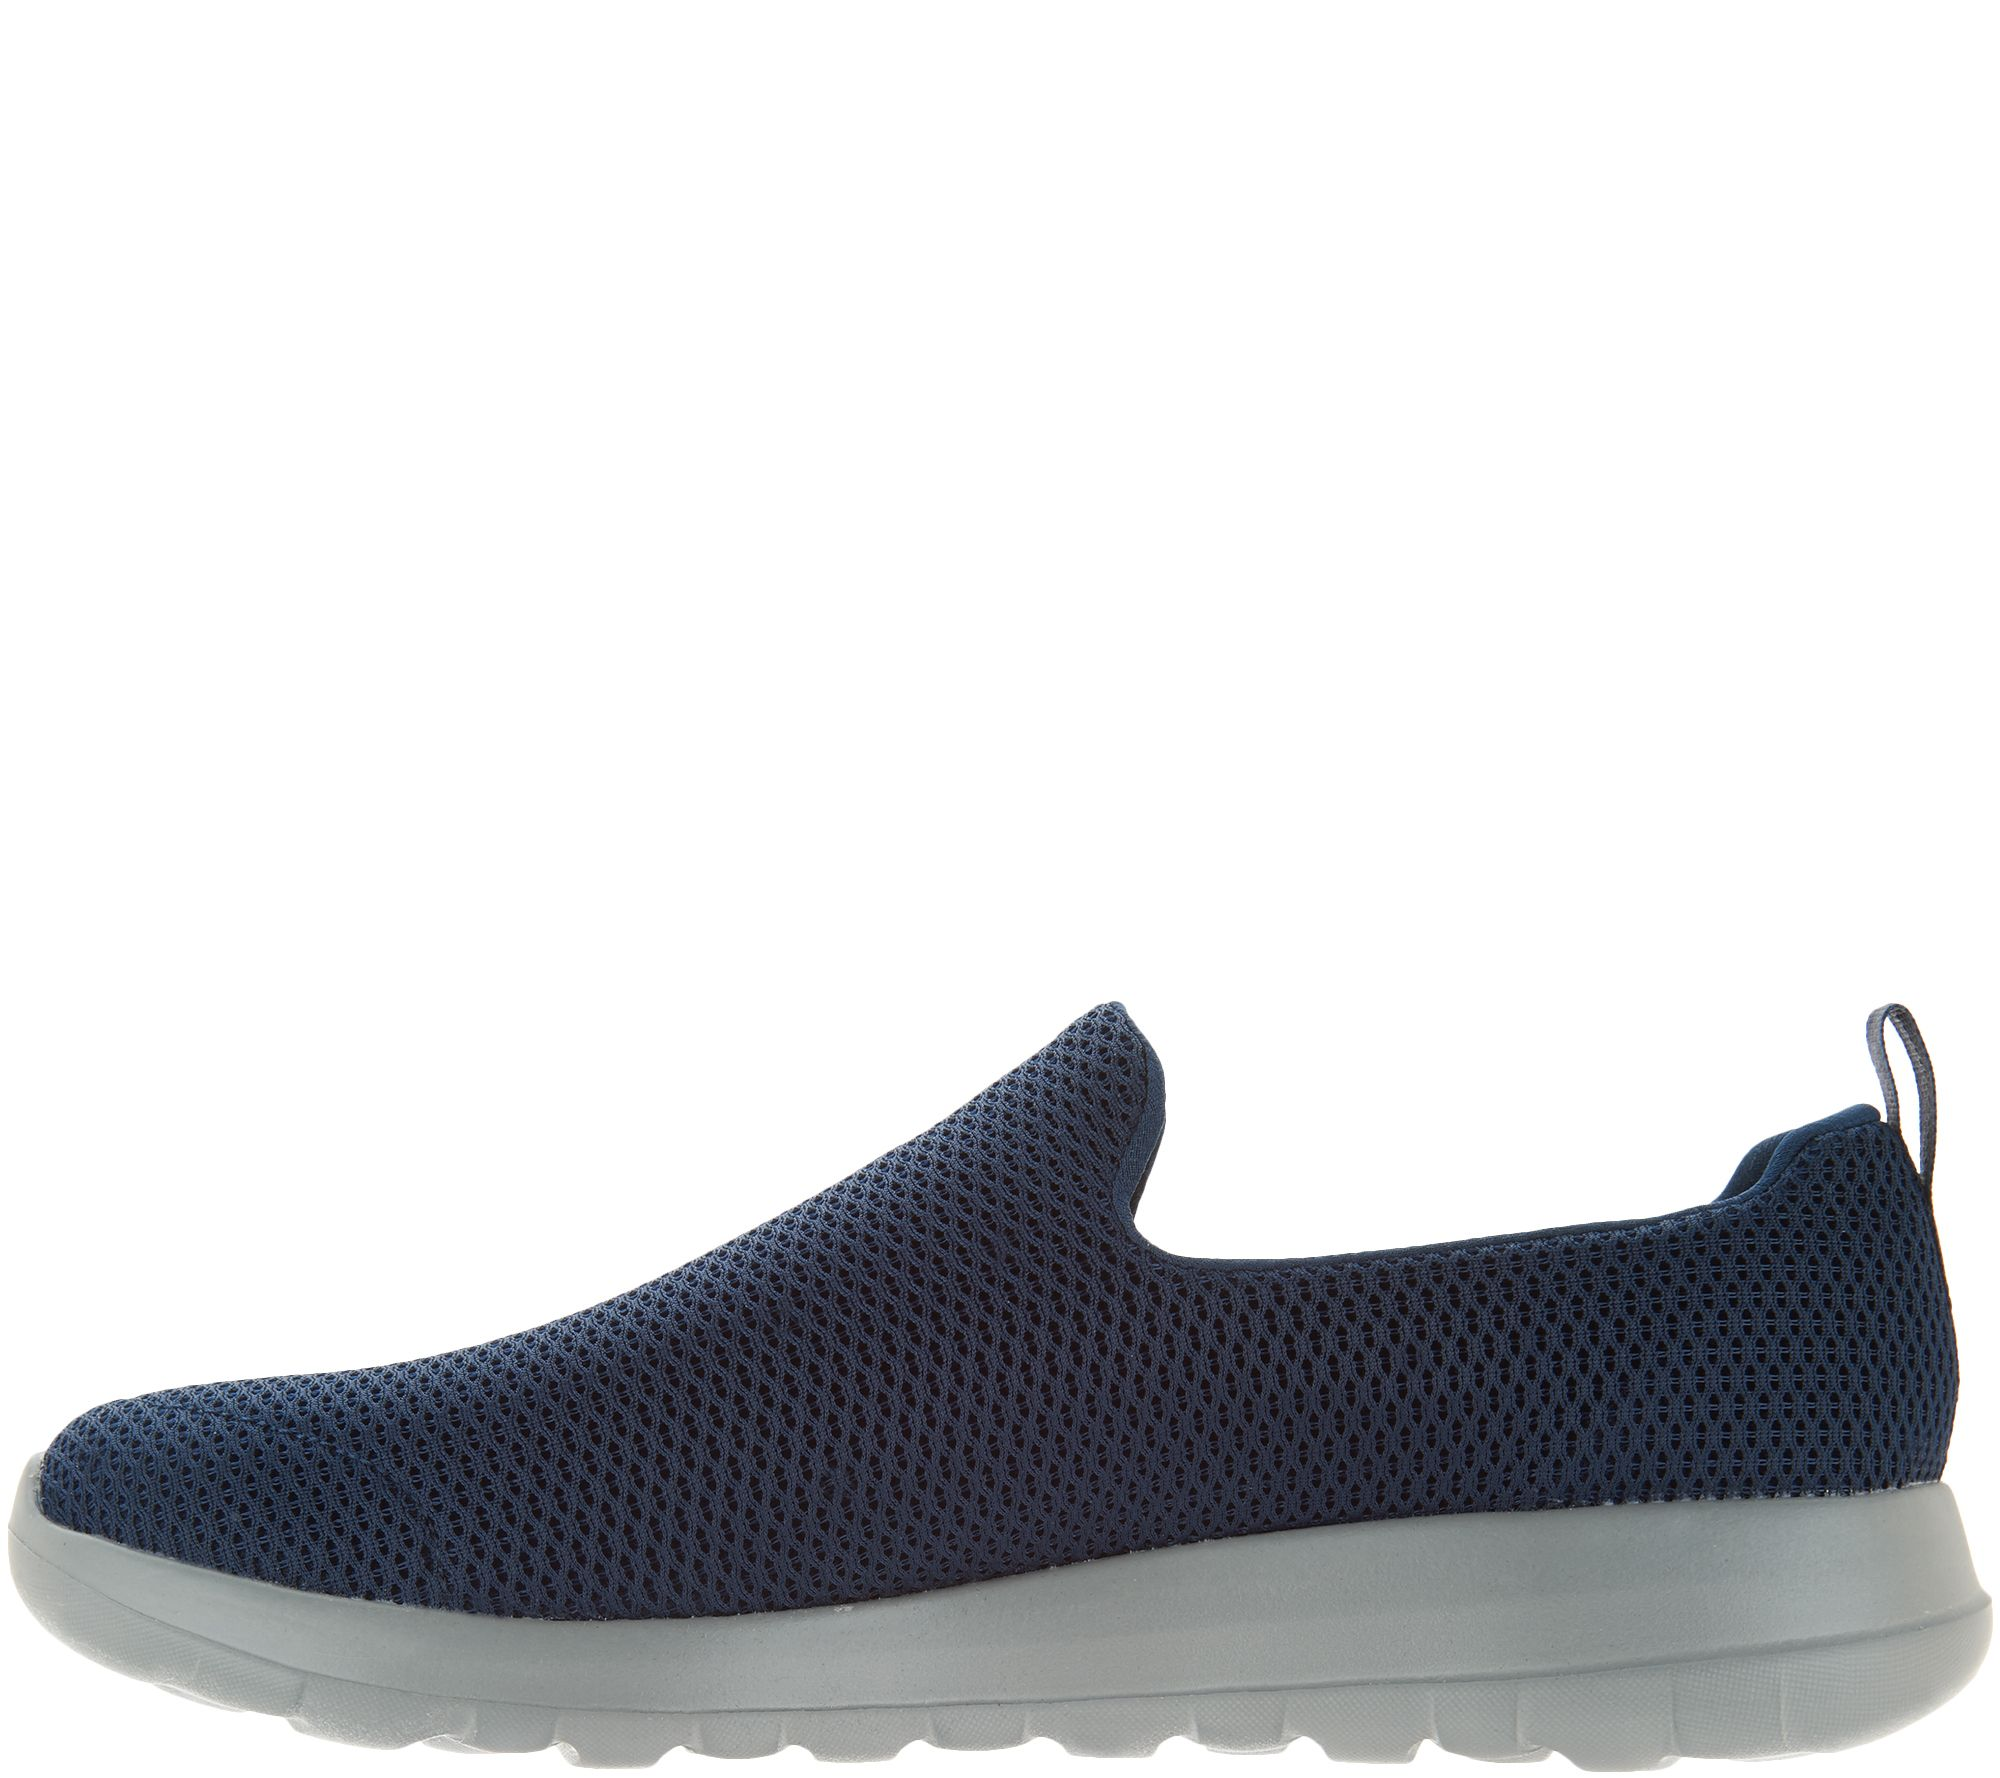 241f2789c9605 Skechers Men s GO Walk Max Mesh Slip-On Shoes - Page 1 — QVC.com